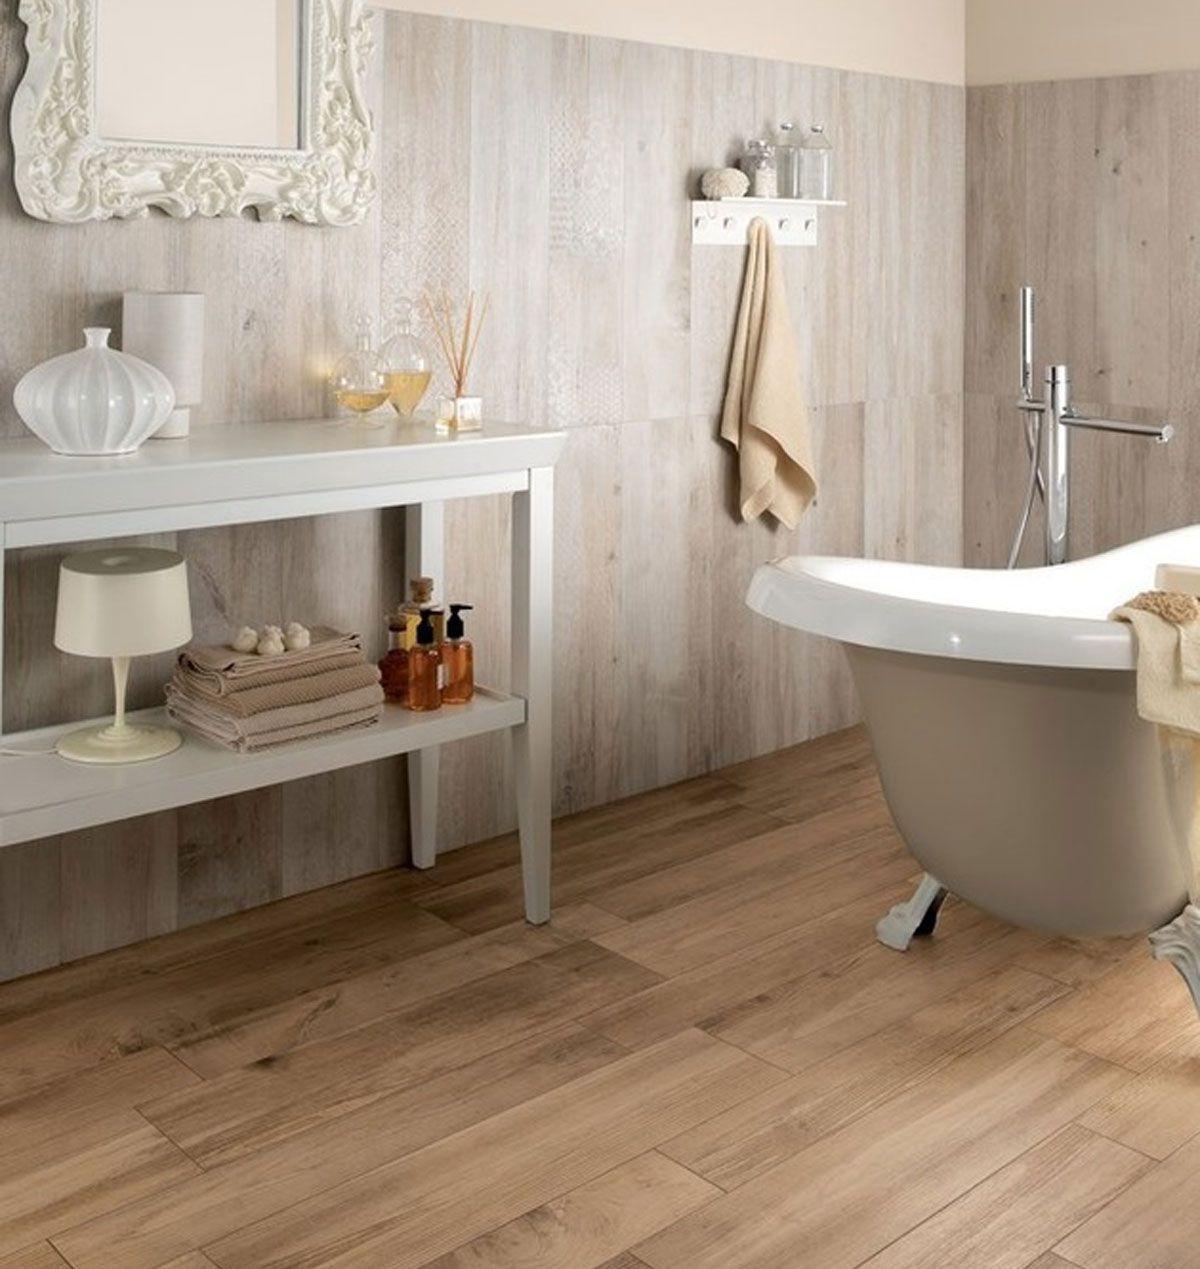 Bathroom Mirror Za podovi za kucu - google search | bad | pinterest | google search